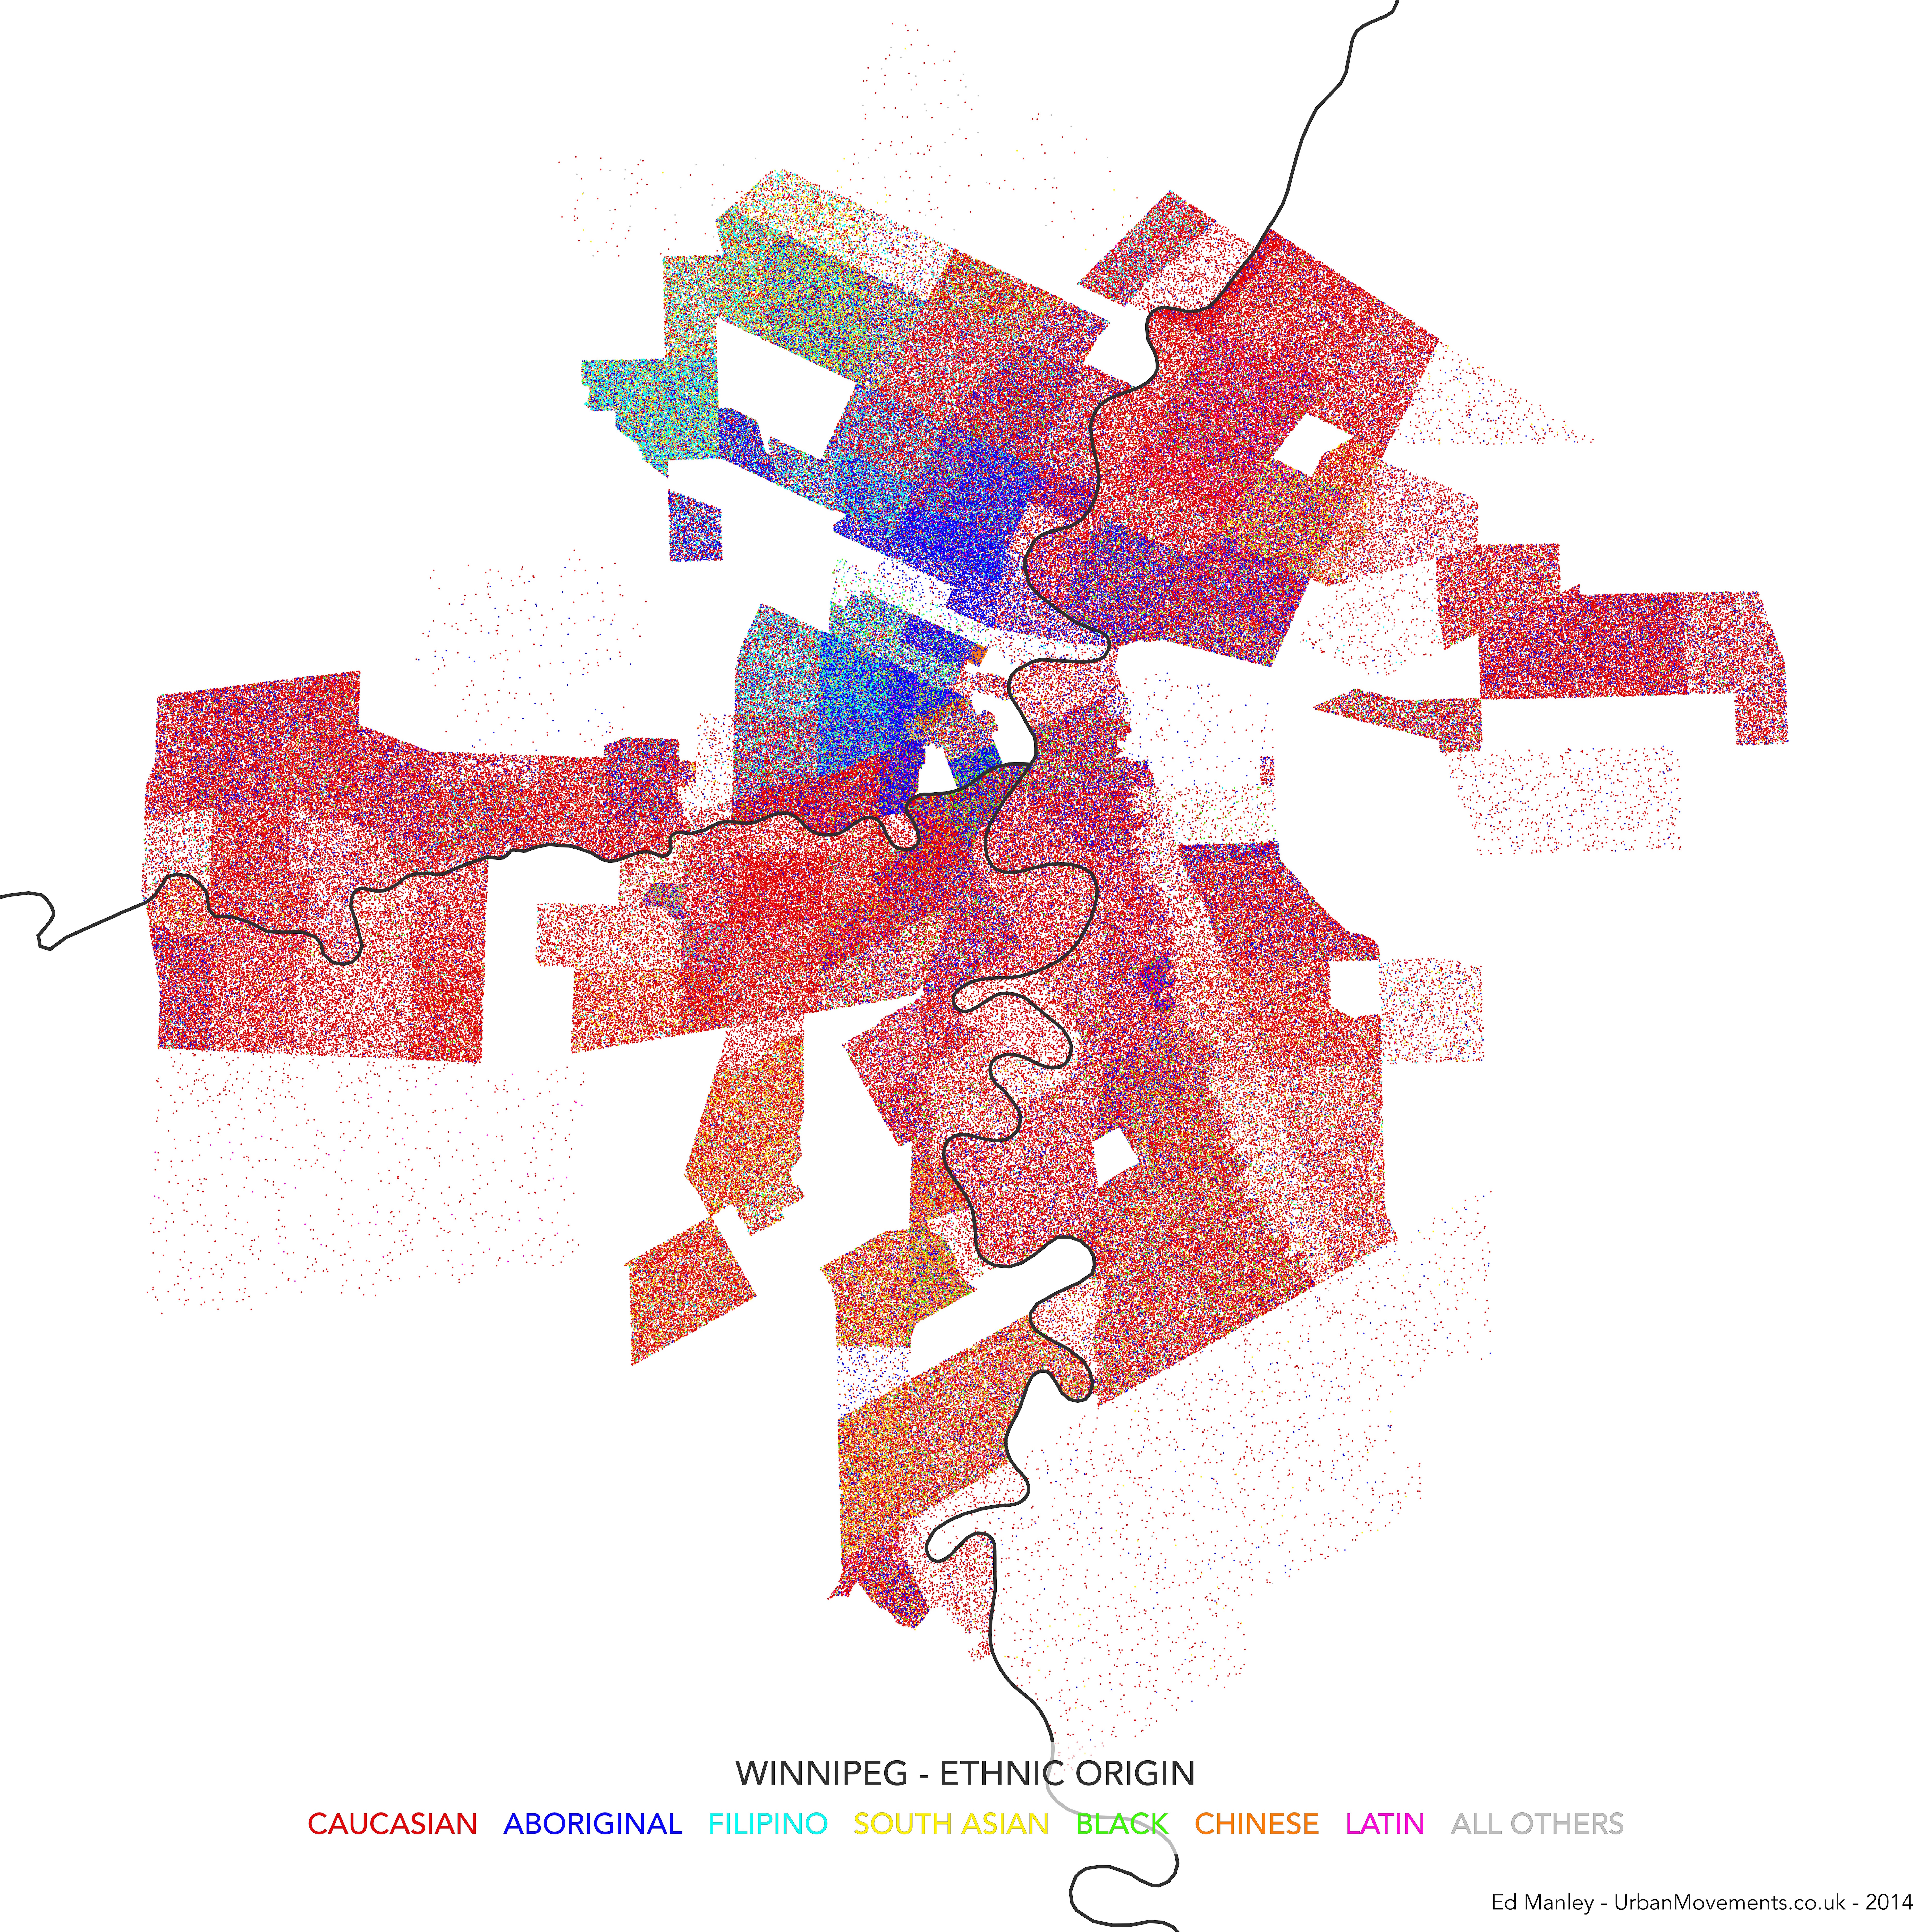 Dot Density Map Of Winnipeg Canada UrbanMovements - Us and canada population density map